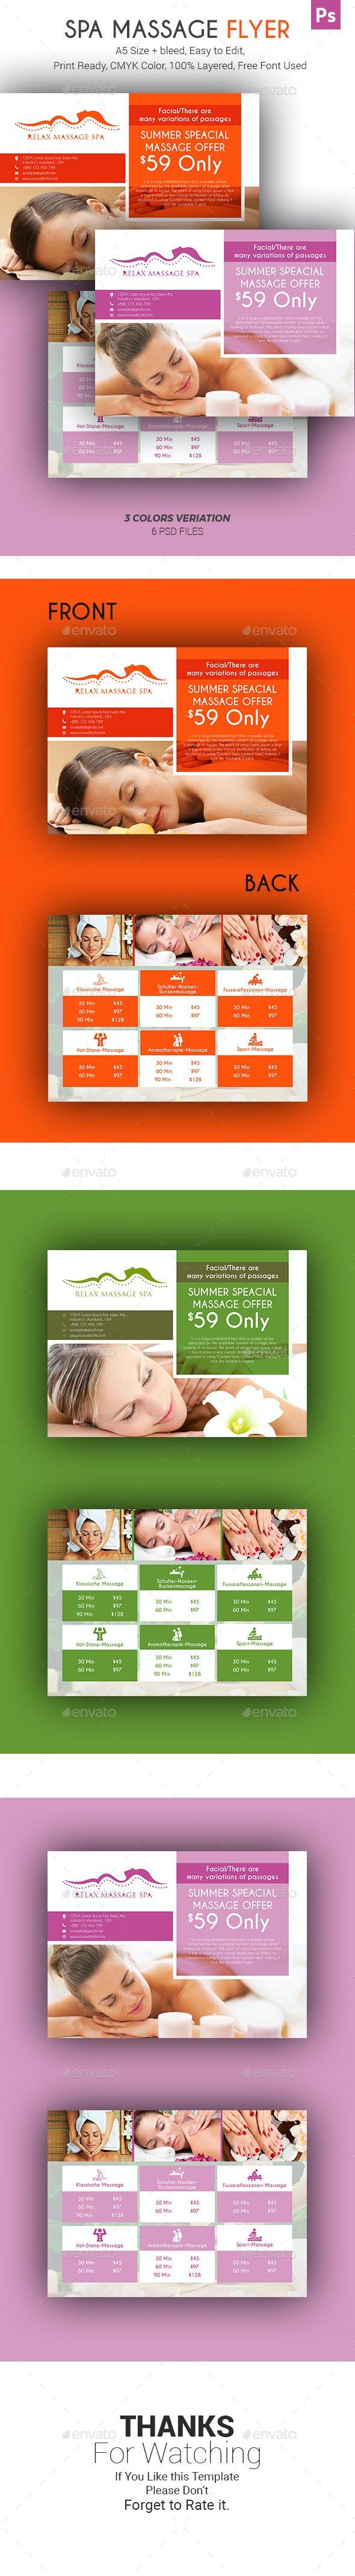 Spa Massage Flyer - Corporate Flyers